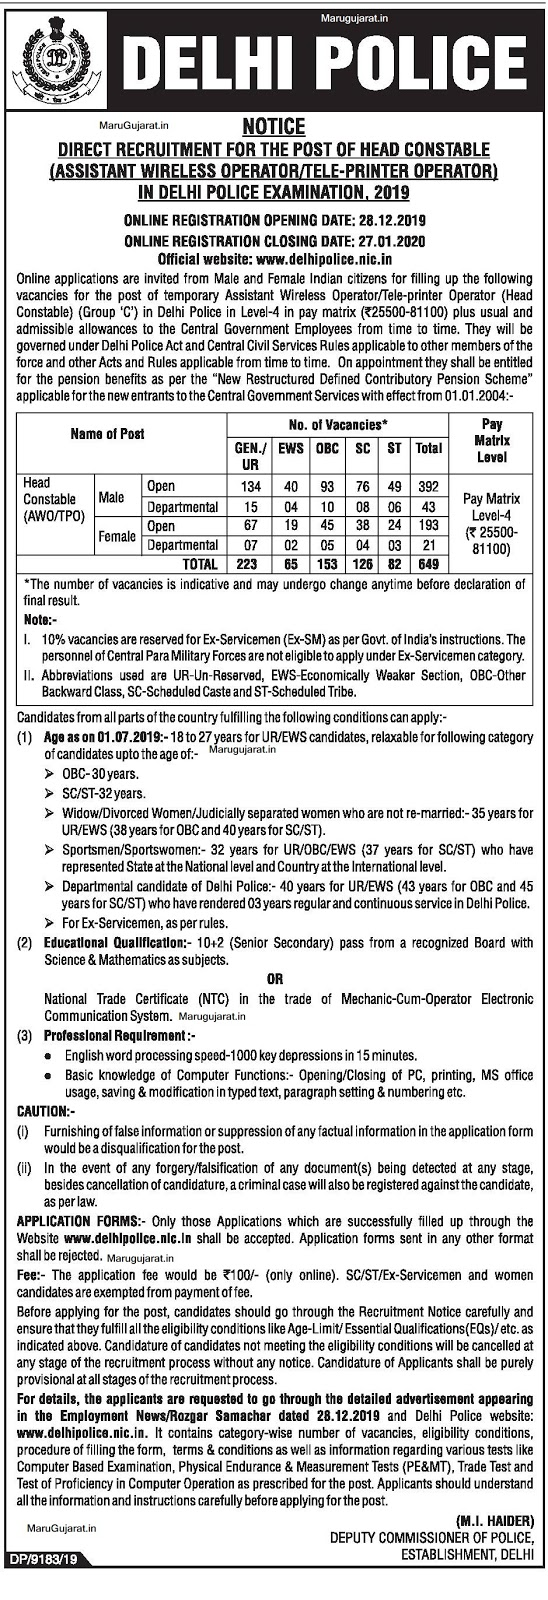 Delhi Police Recruitment For Head Constable (AWO / TPO) - GVTJOB.COM